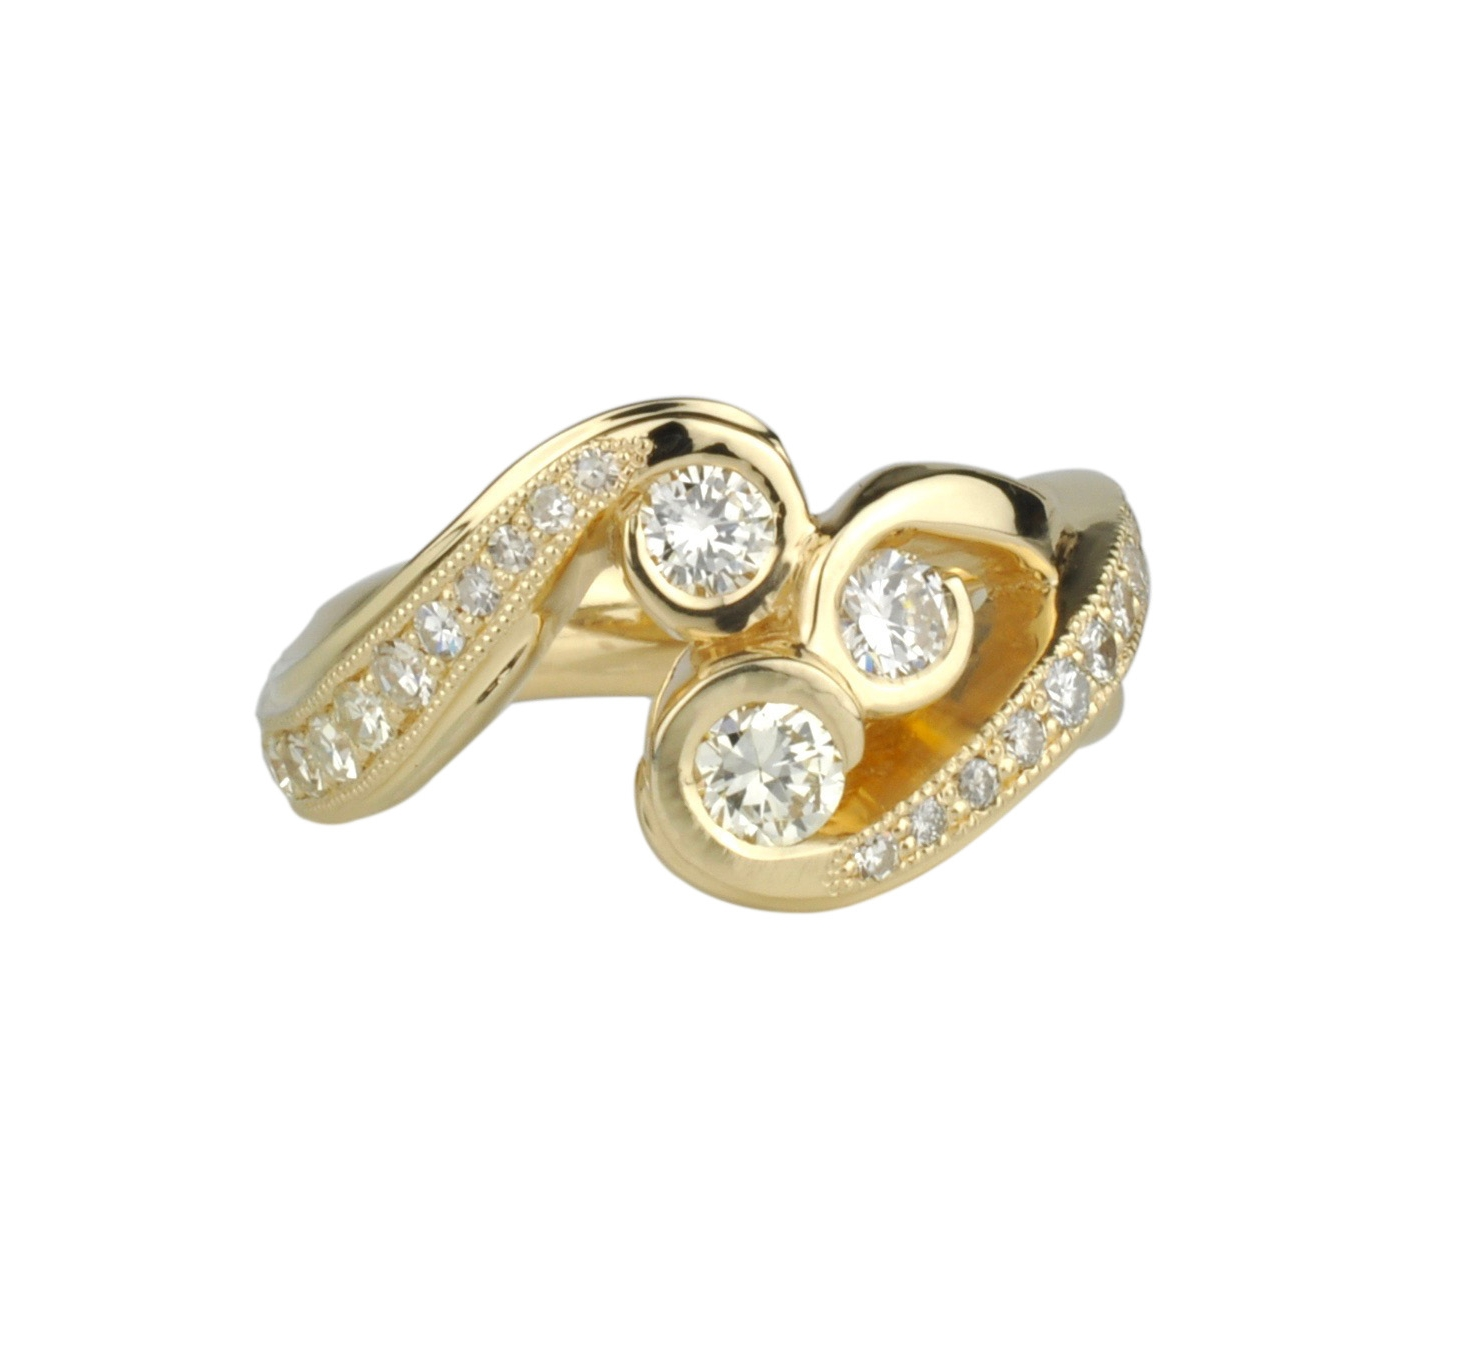 14k Gold Waylon Rhoads Original with Diamonds